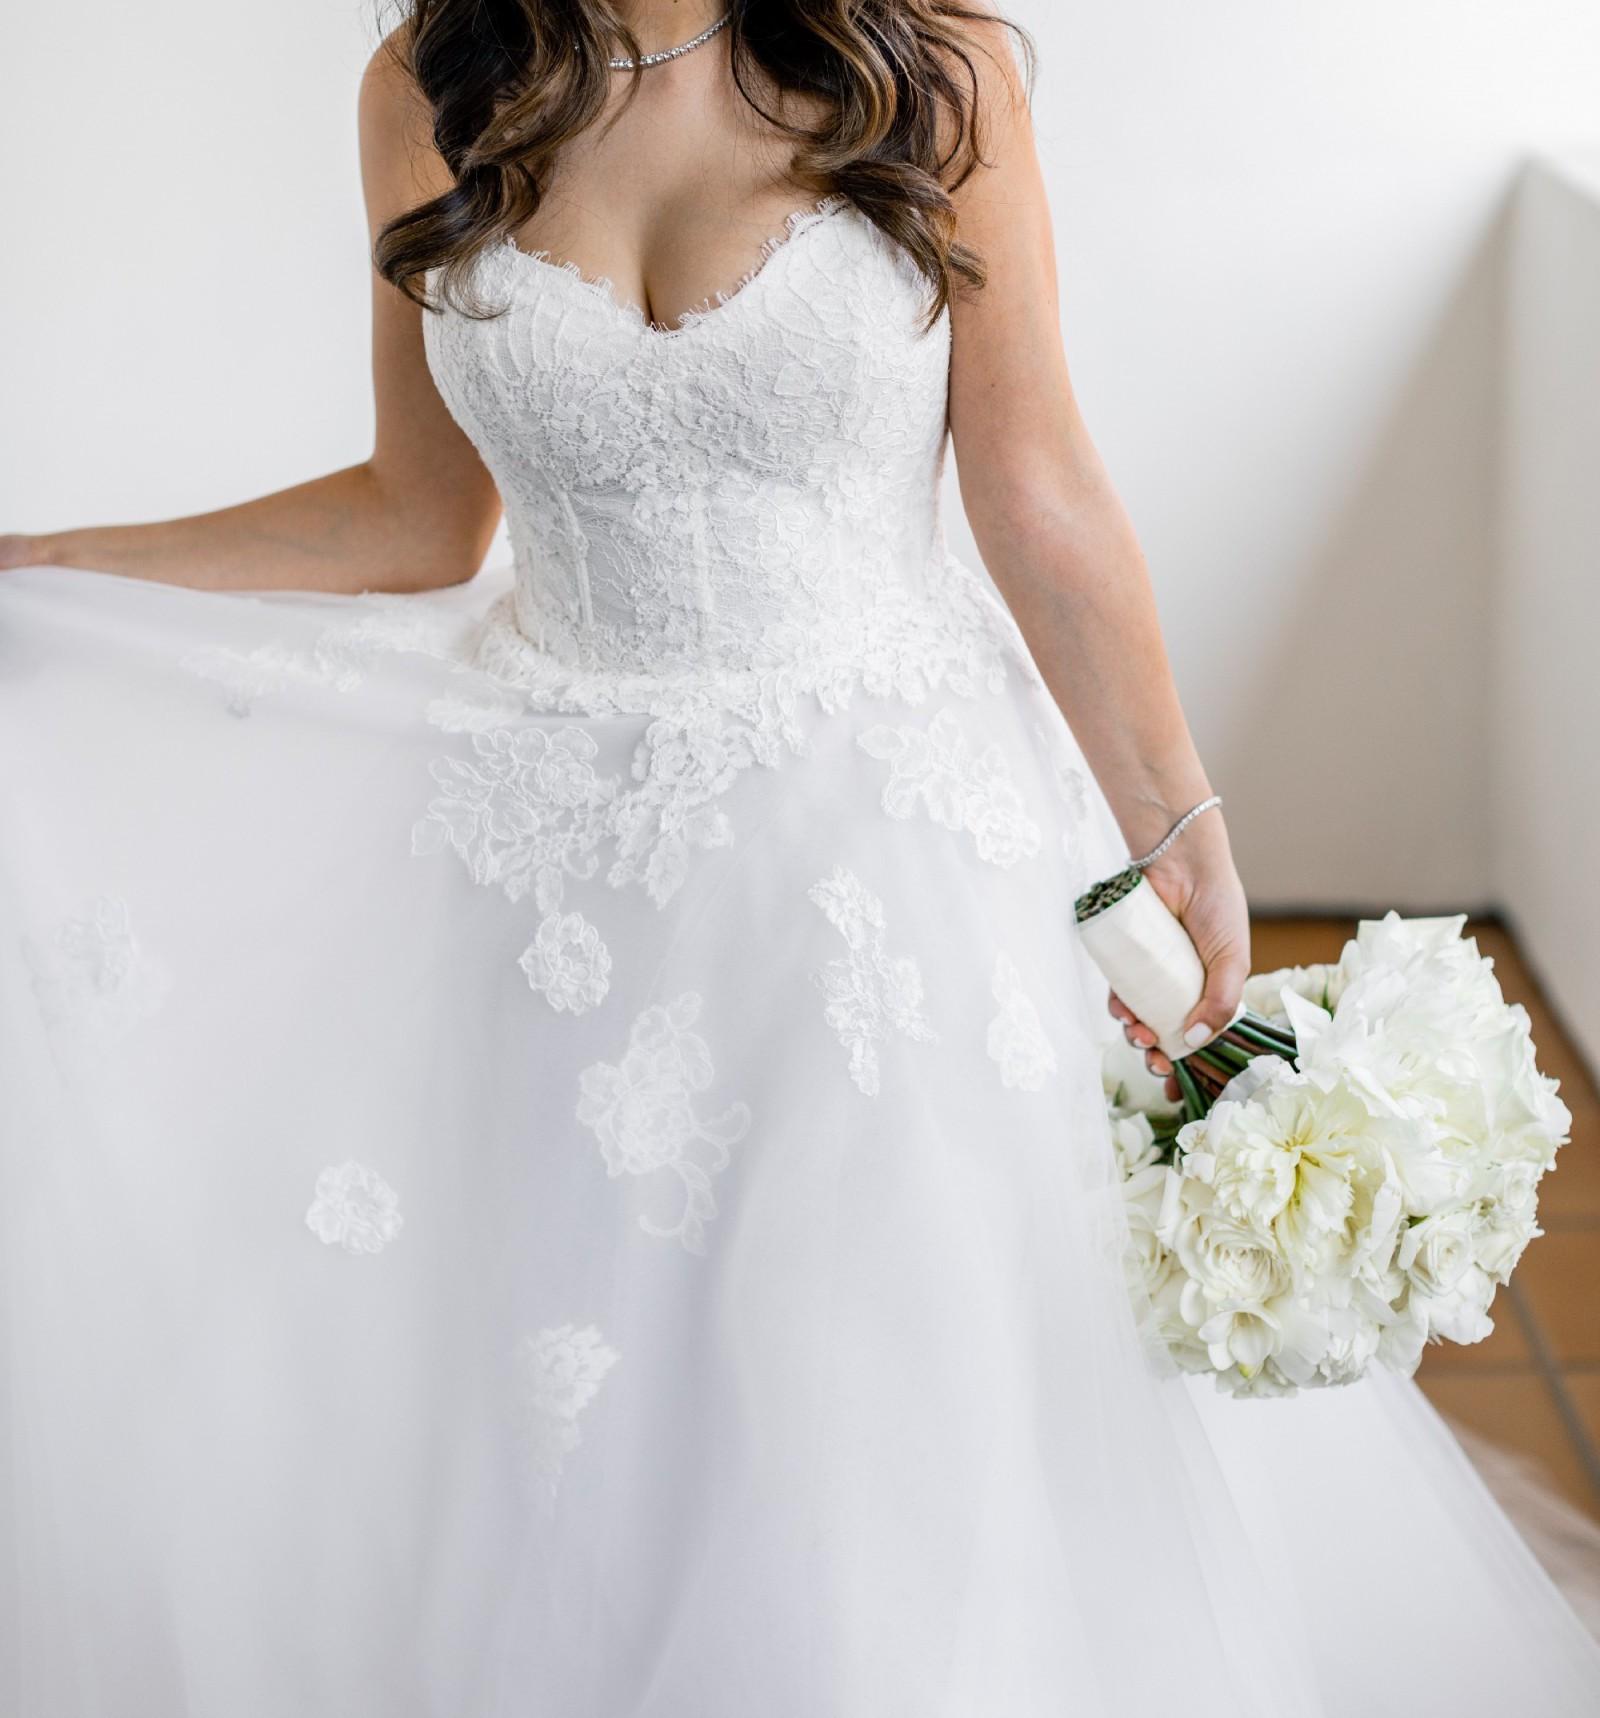 Monique Lhuillier Second Hand Wedding Dress Save 32